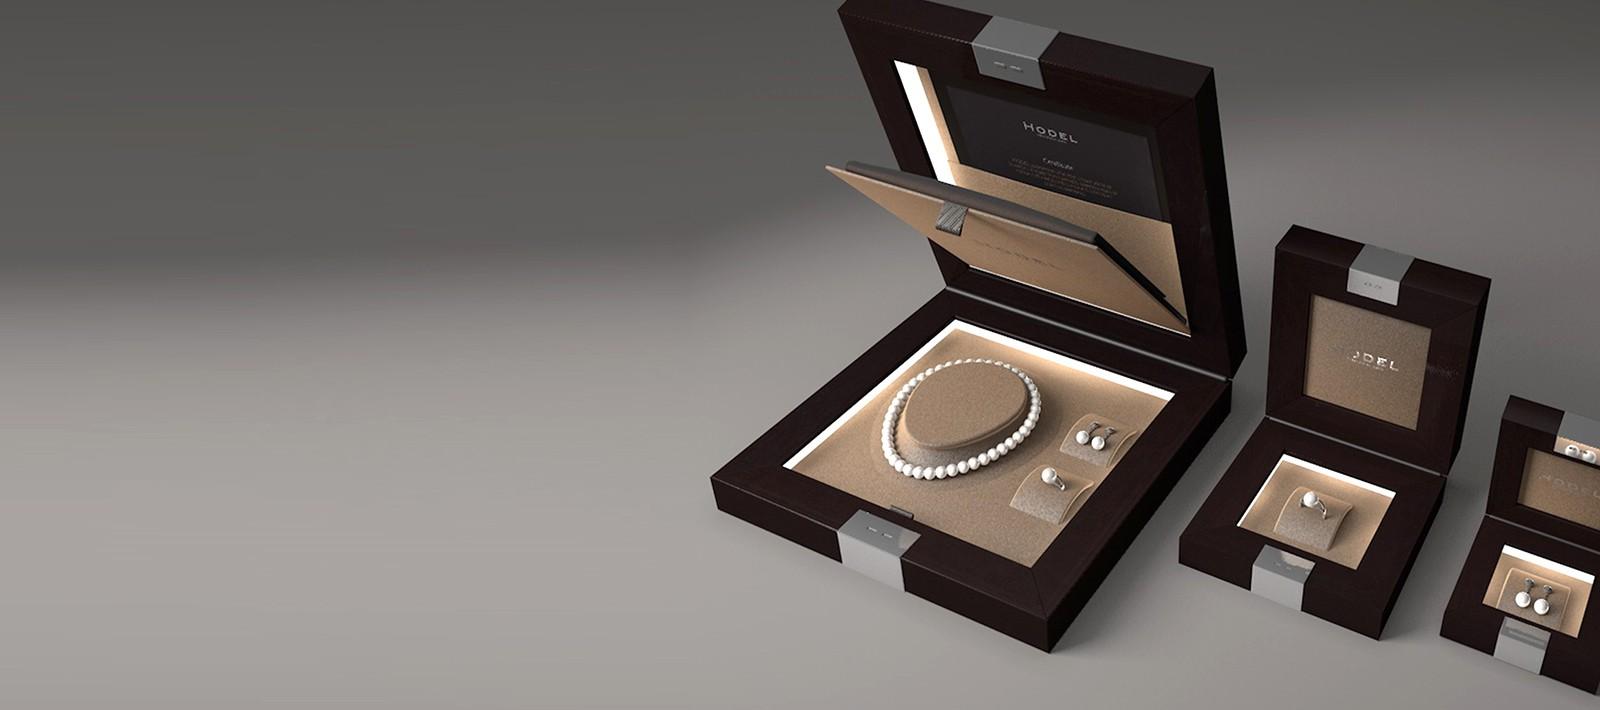 Hodel-jewellery-packaging-design-2